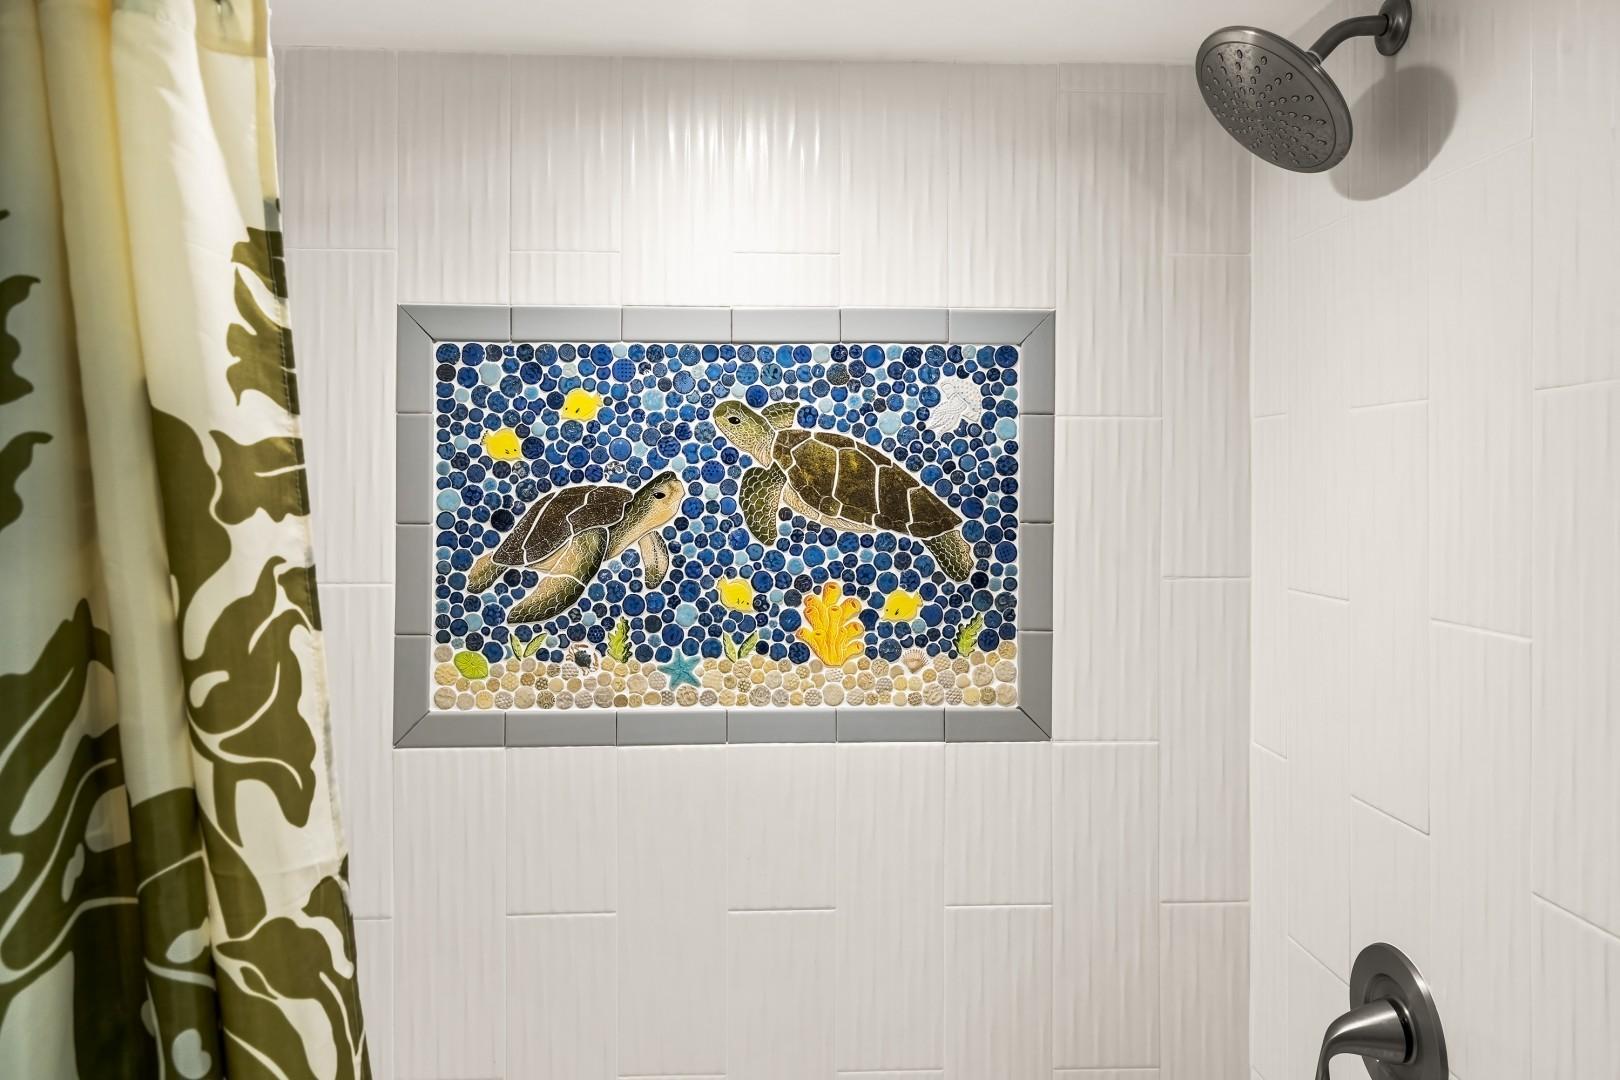 Guest bathroom shower with mosaic tile design